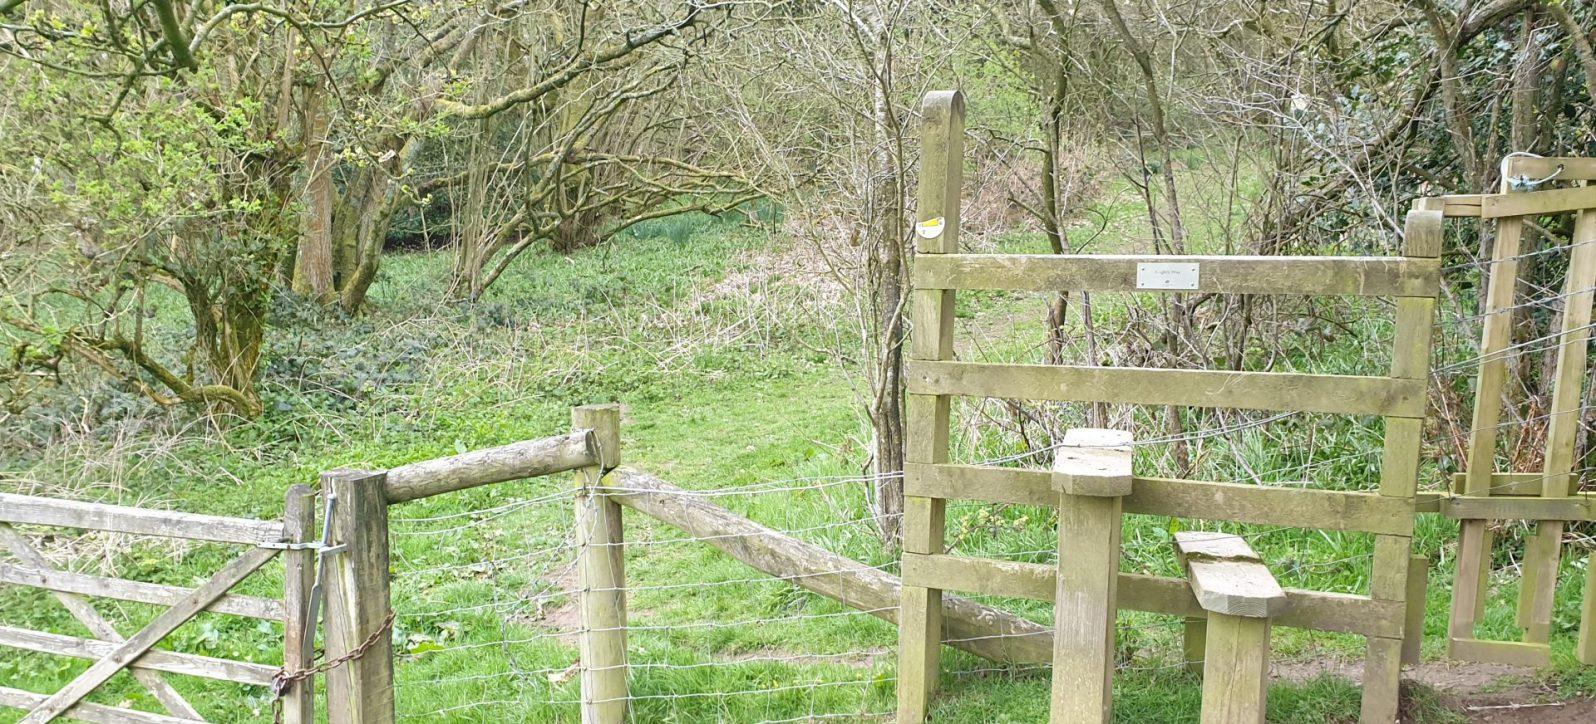 Walk up Caer Caradoc Hill from Church Stretton